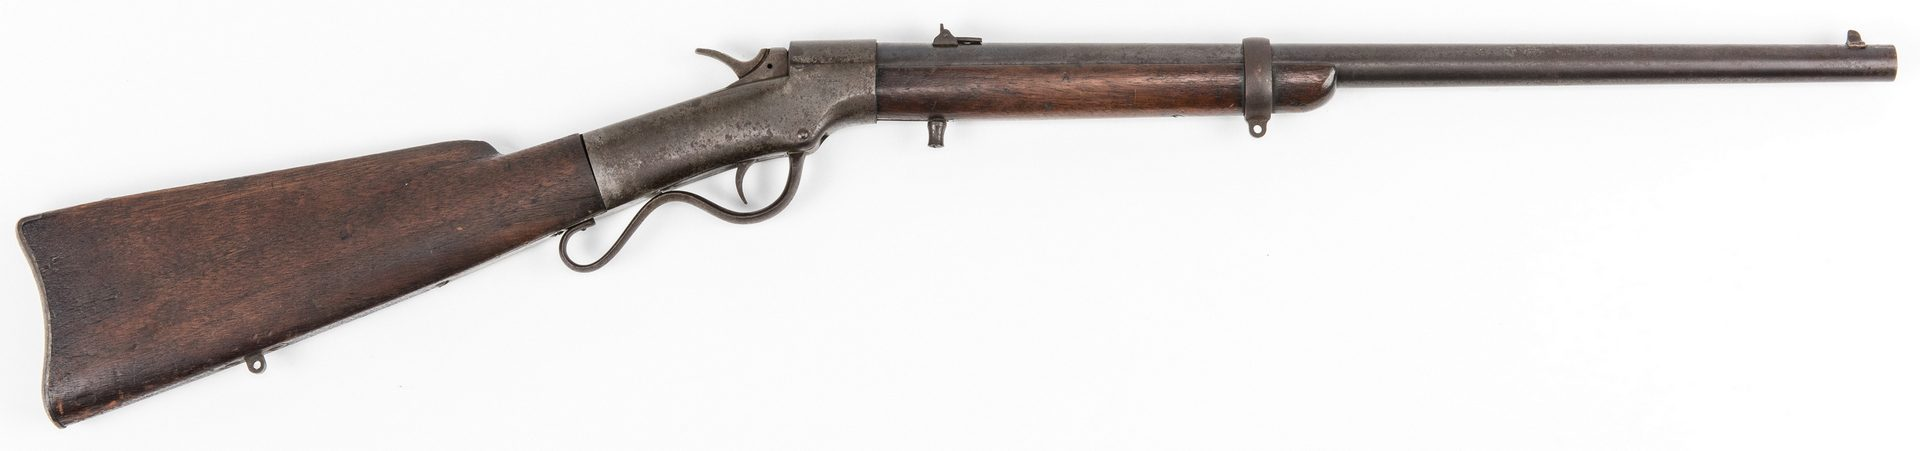 Lot 319: Agent Marked Merwin and Bray Ballard Model 1861 Carbine, .44 cal